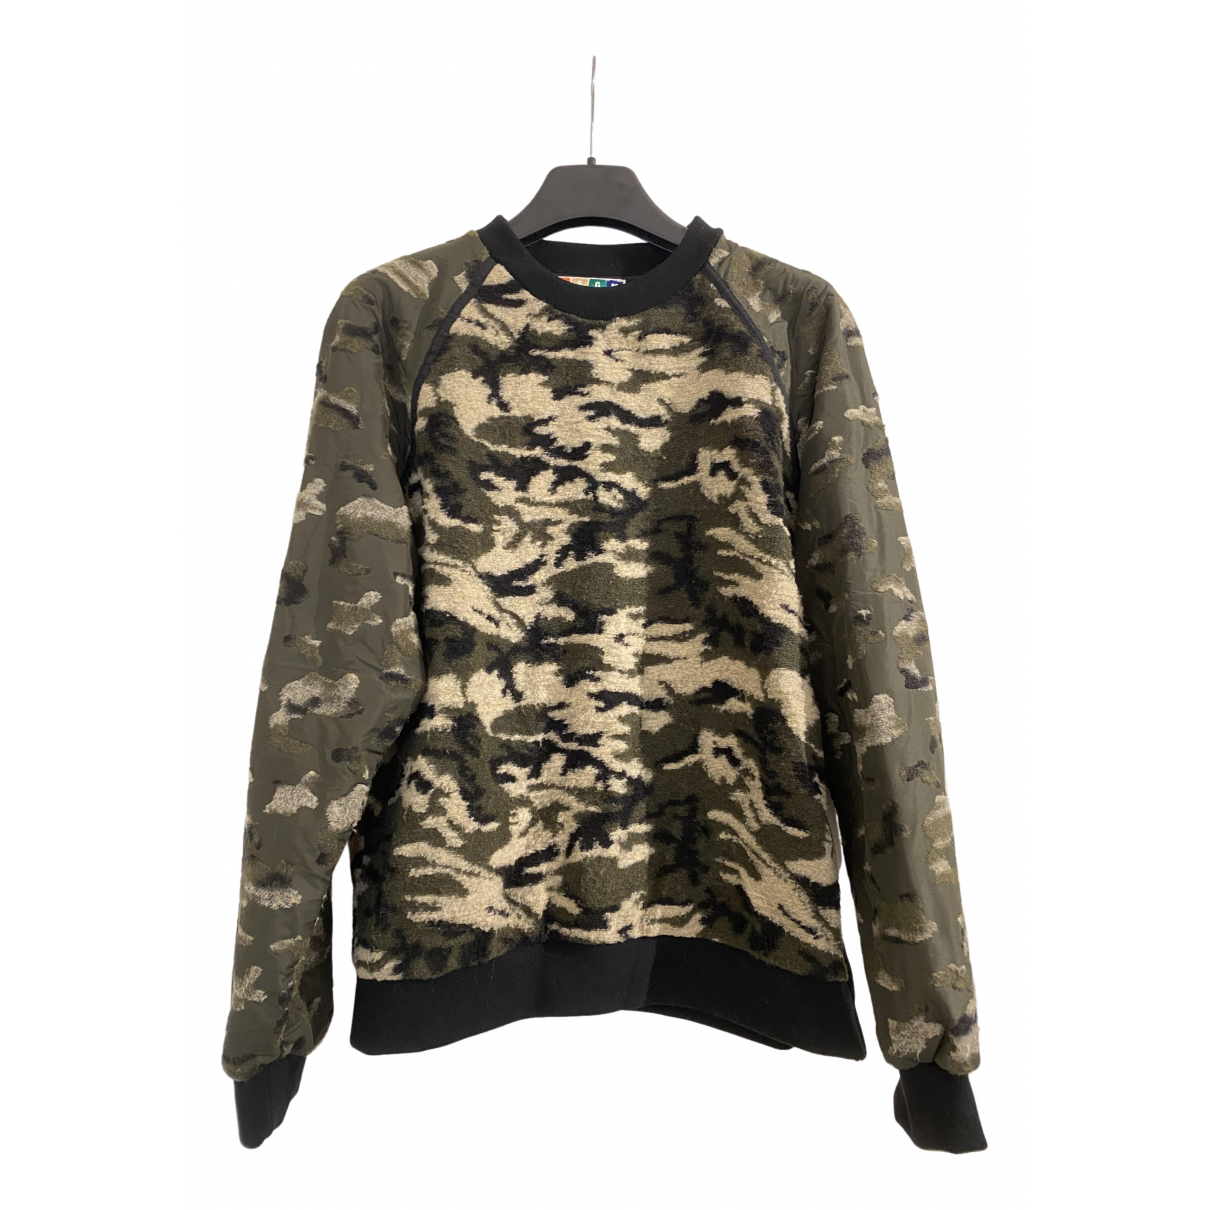 Msgm \N Khaki Knitwear & Sweatshirts for Men 46 IT